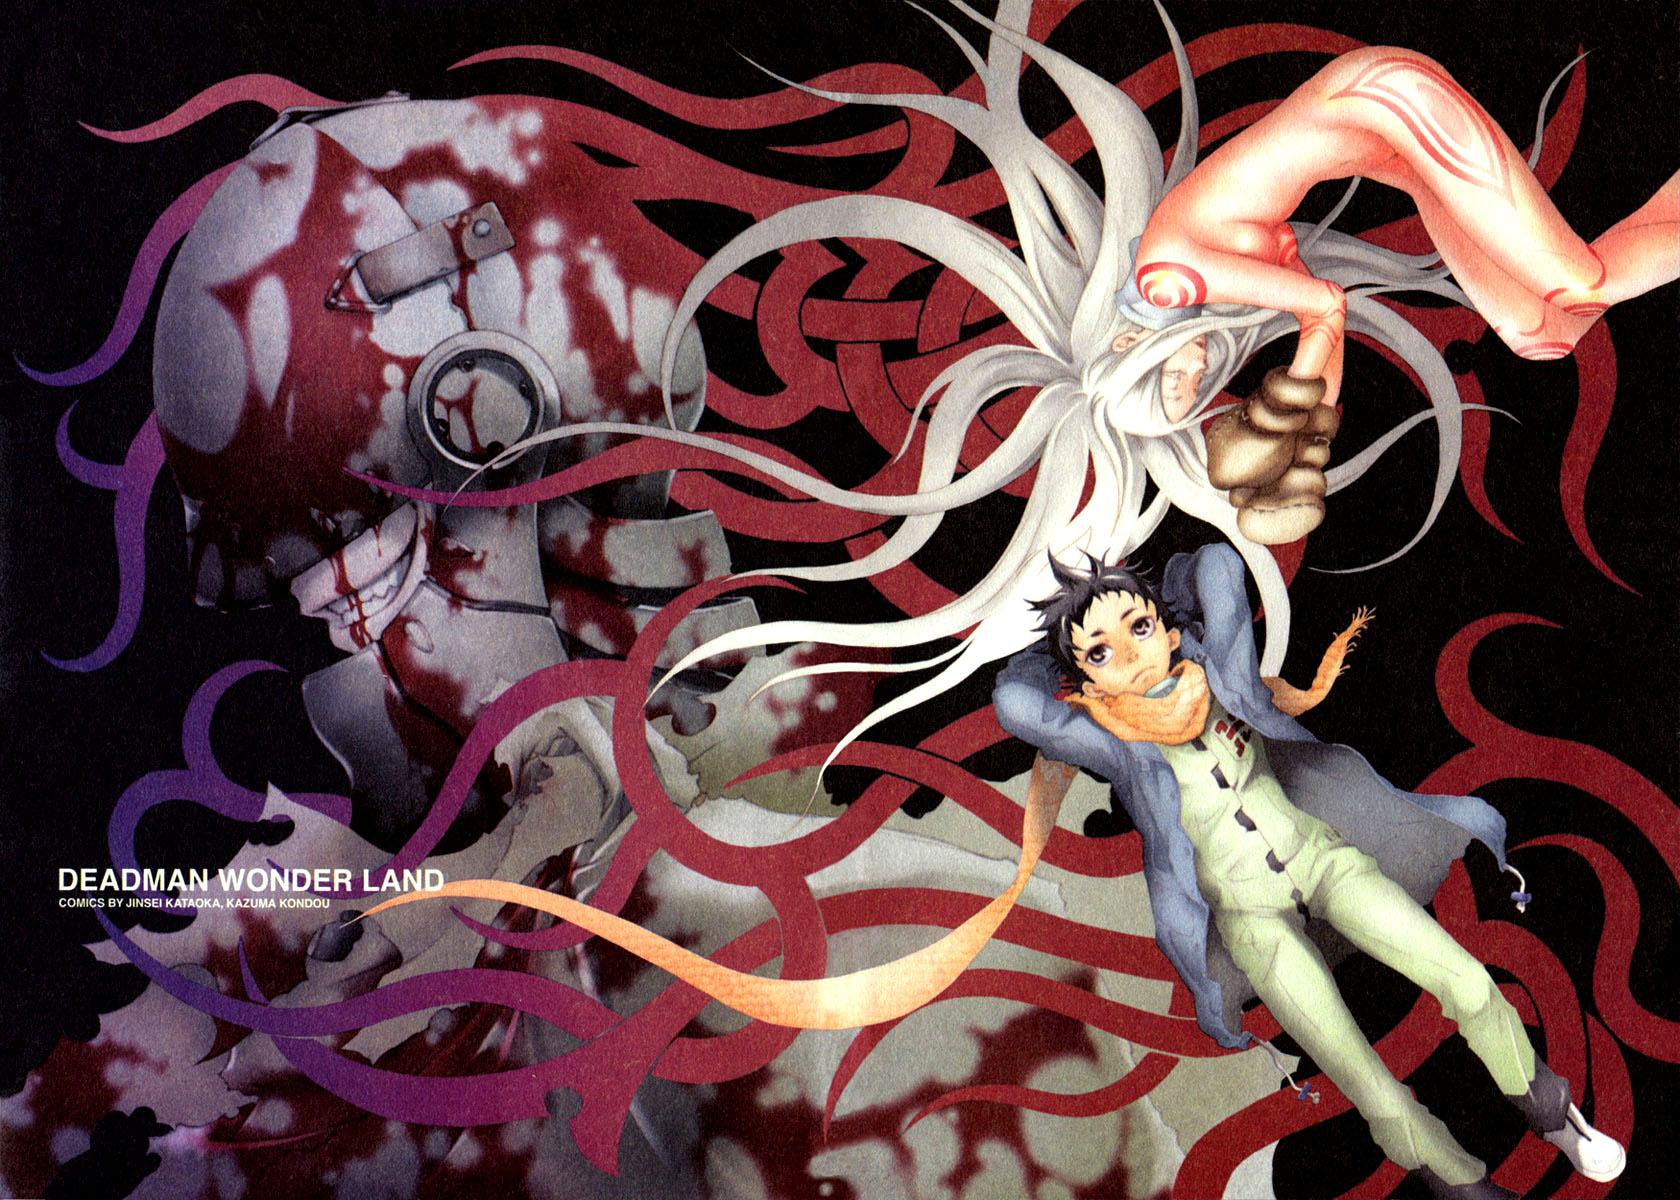 Manga recomendado deadman wonderland for Imagenes de anime gore